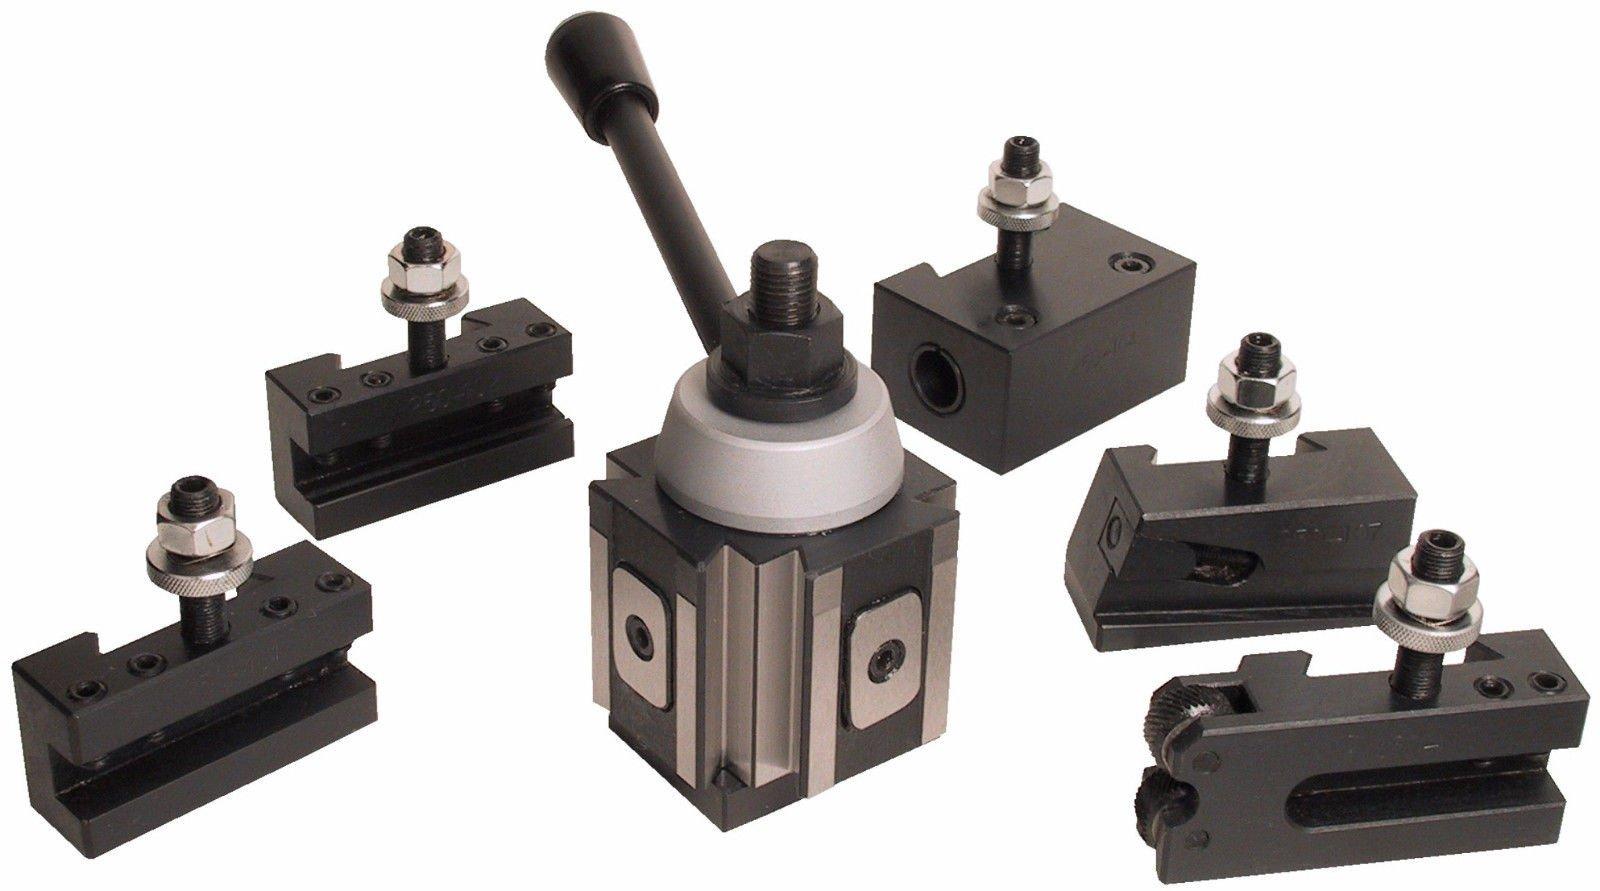 LLDSIMEX 6-12'' Piston Type Quick Change Tool Set 100 AXA